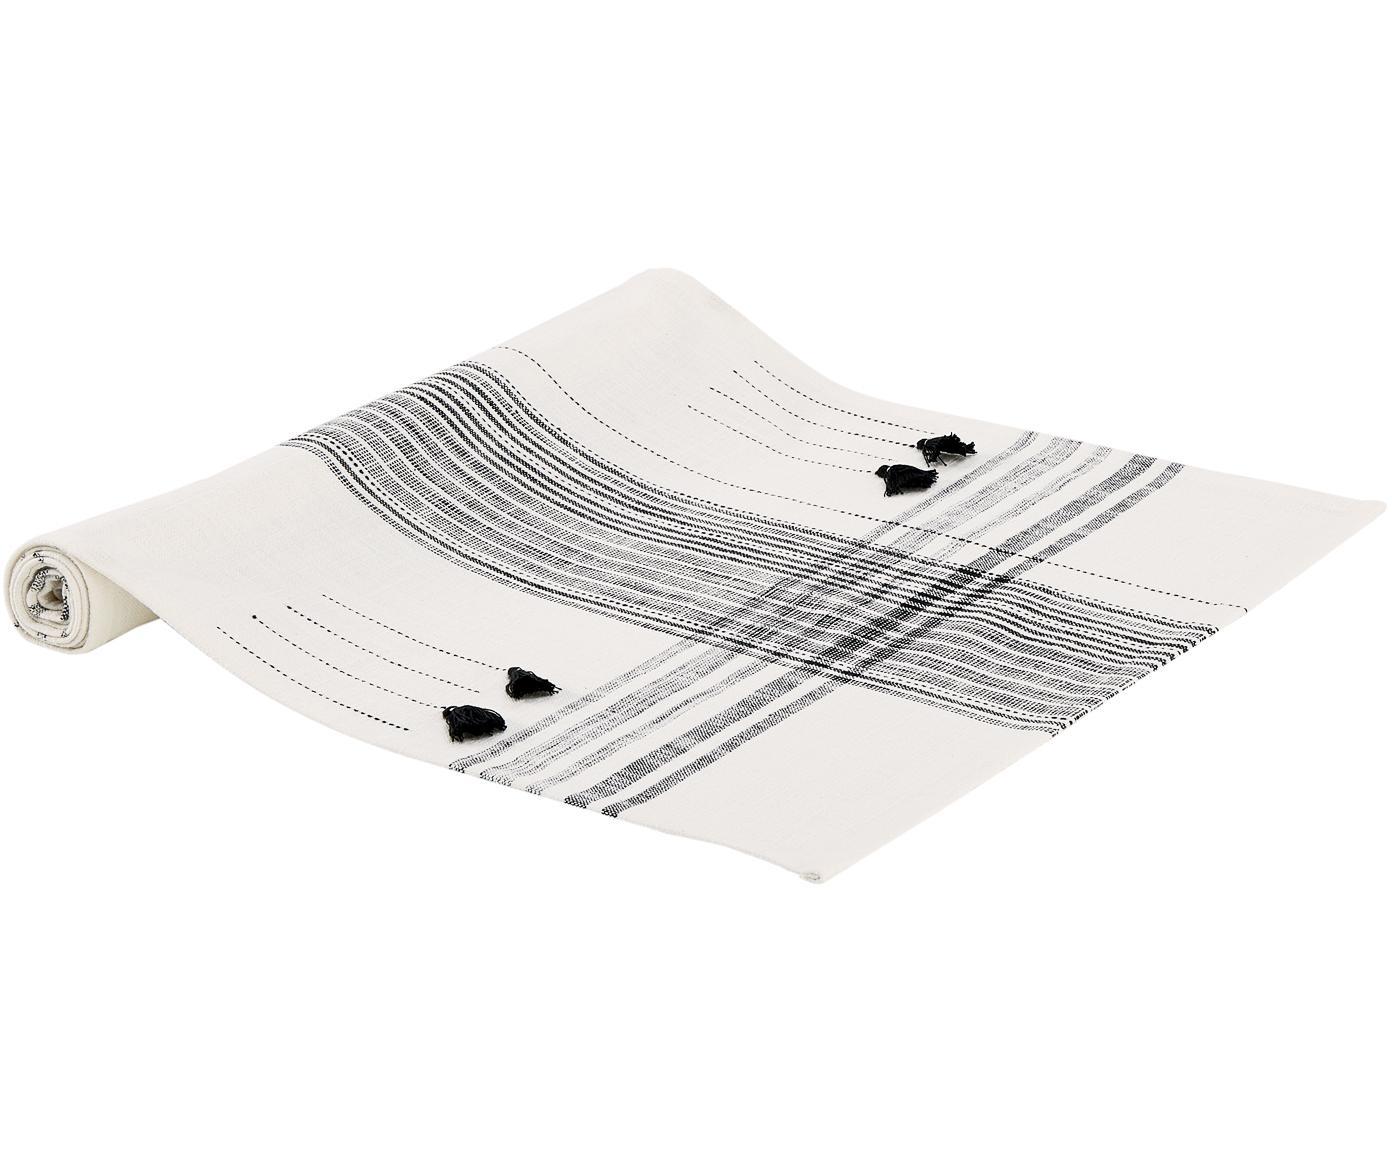 Runner da tavolo Sasel, Cotone, Bianco latteo, nero, Larg. 45 x Lung. 150 cm